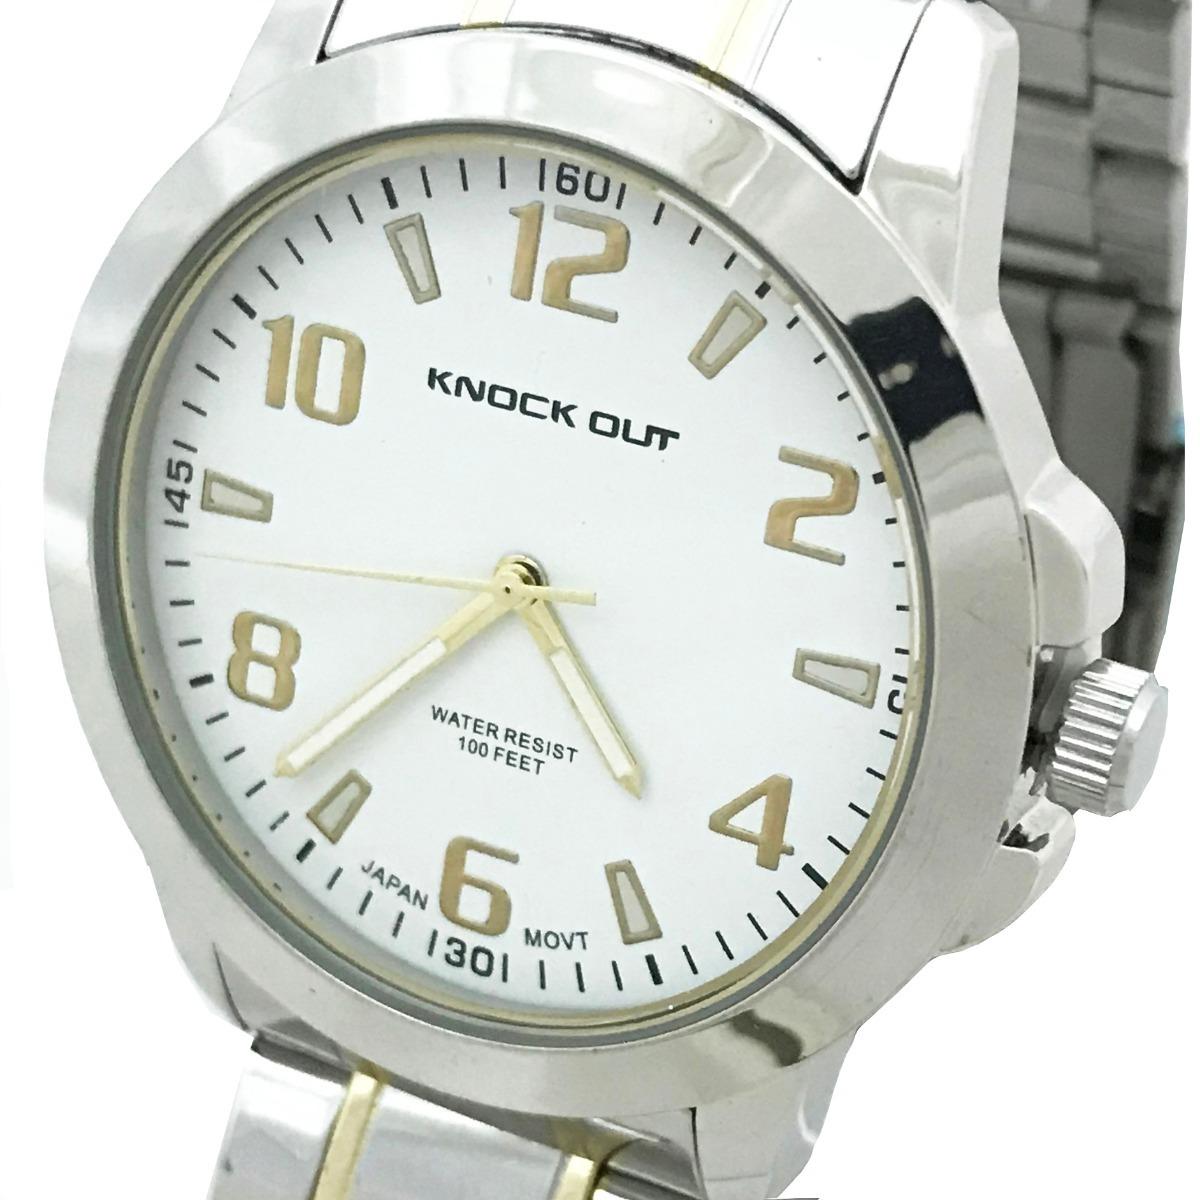 5003f8f60280 reloj knock out 2359 plata hombre caballero metalico. Cargando zoom.